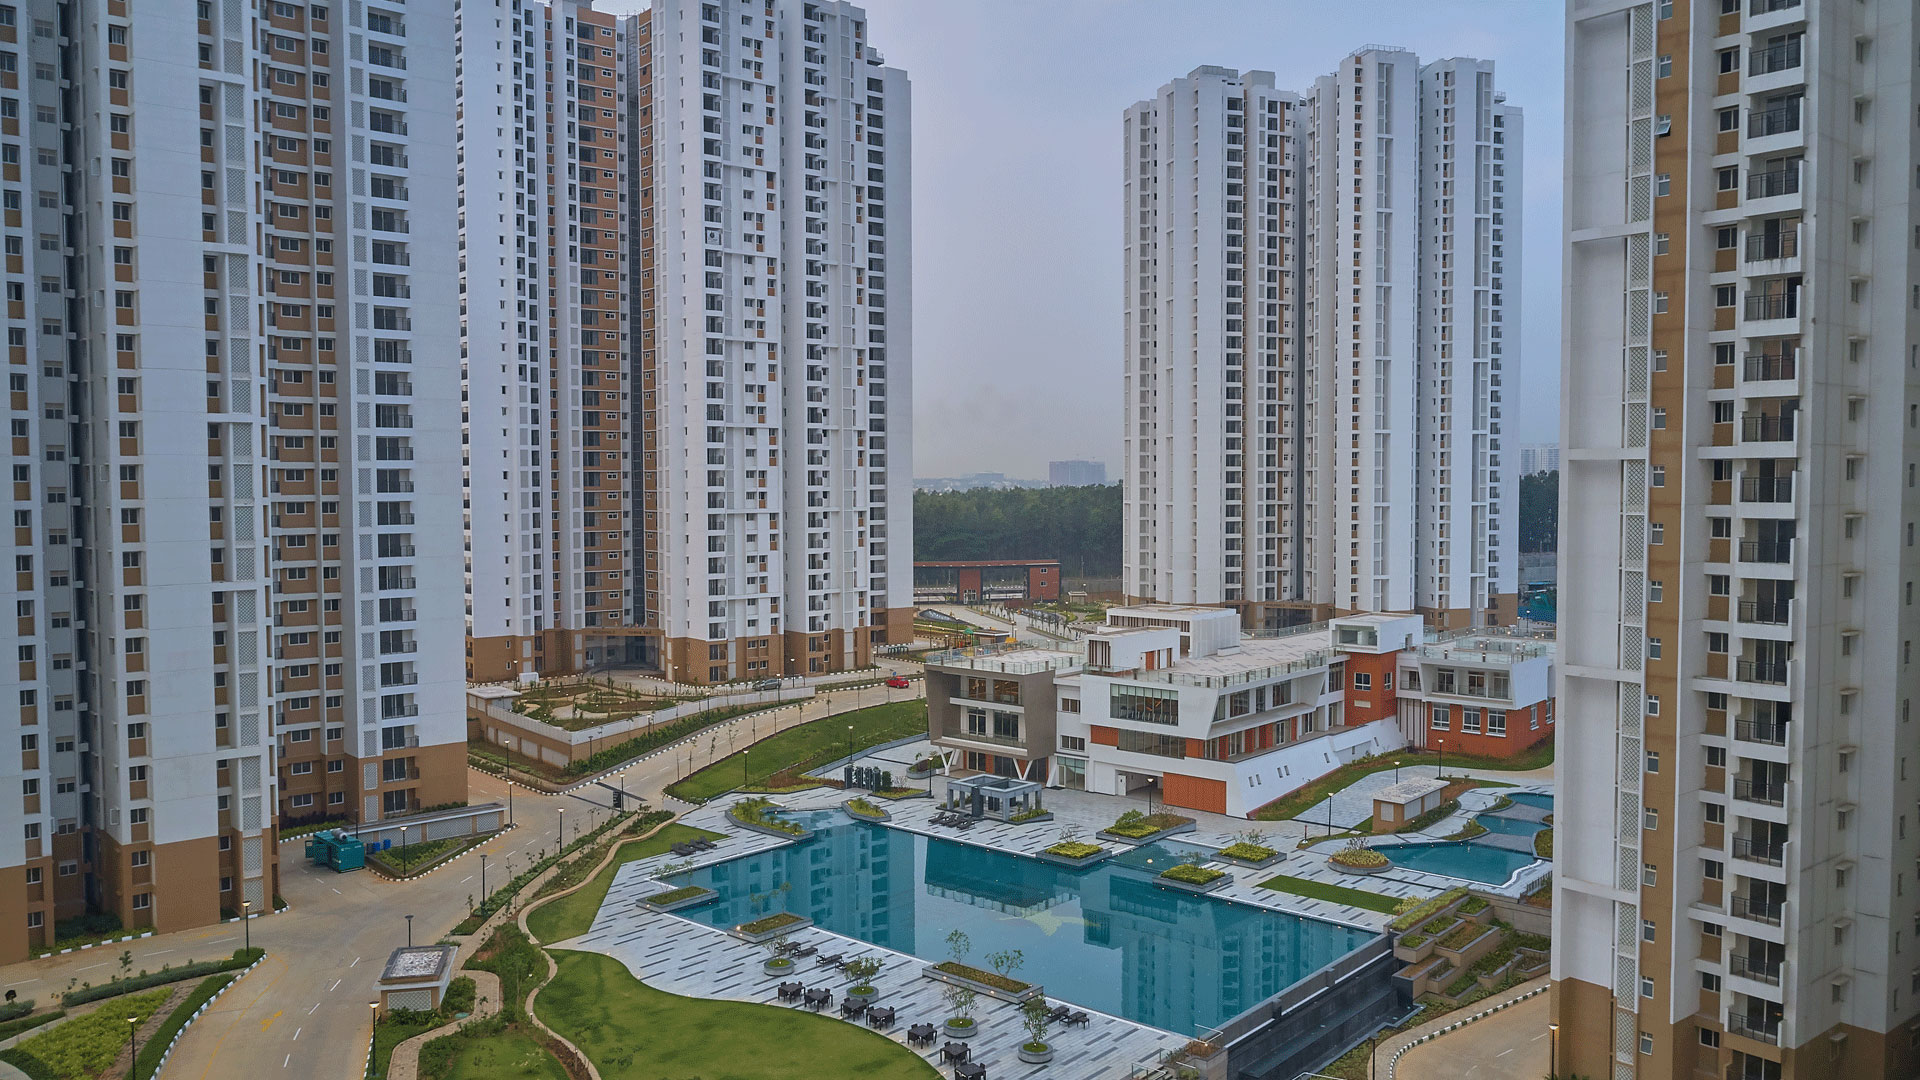 prestige-falcon-city-Kanakapura-rd-Bangalore-Image-03